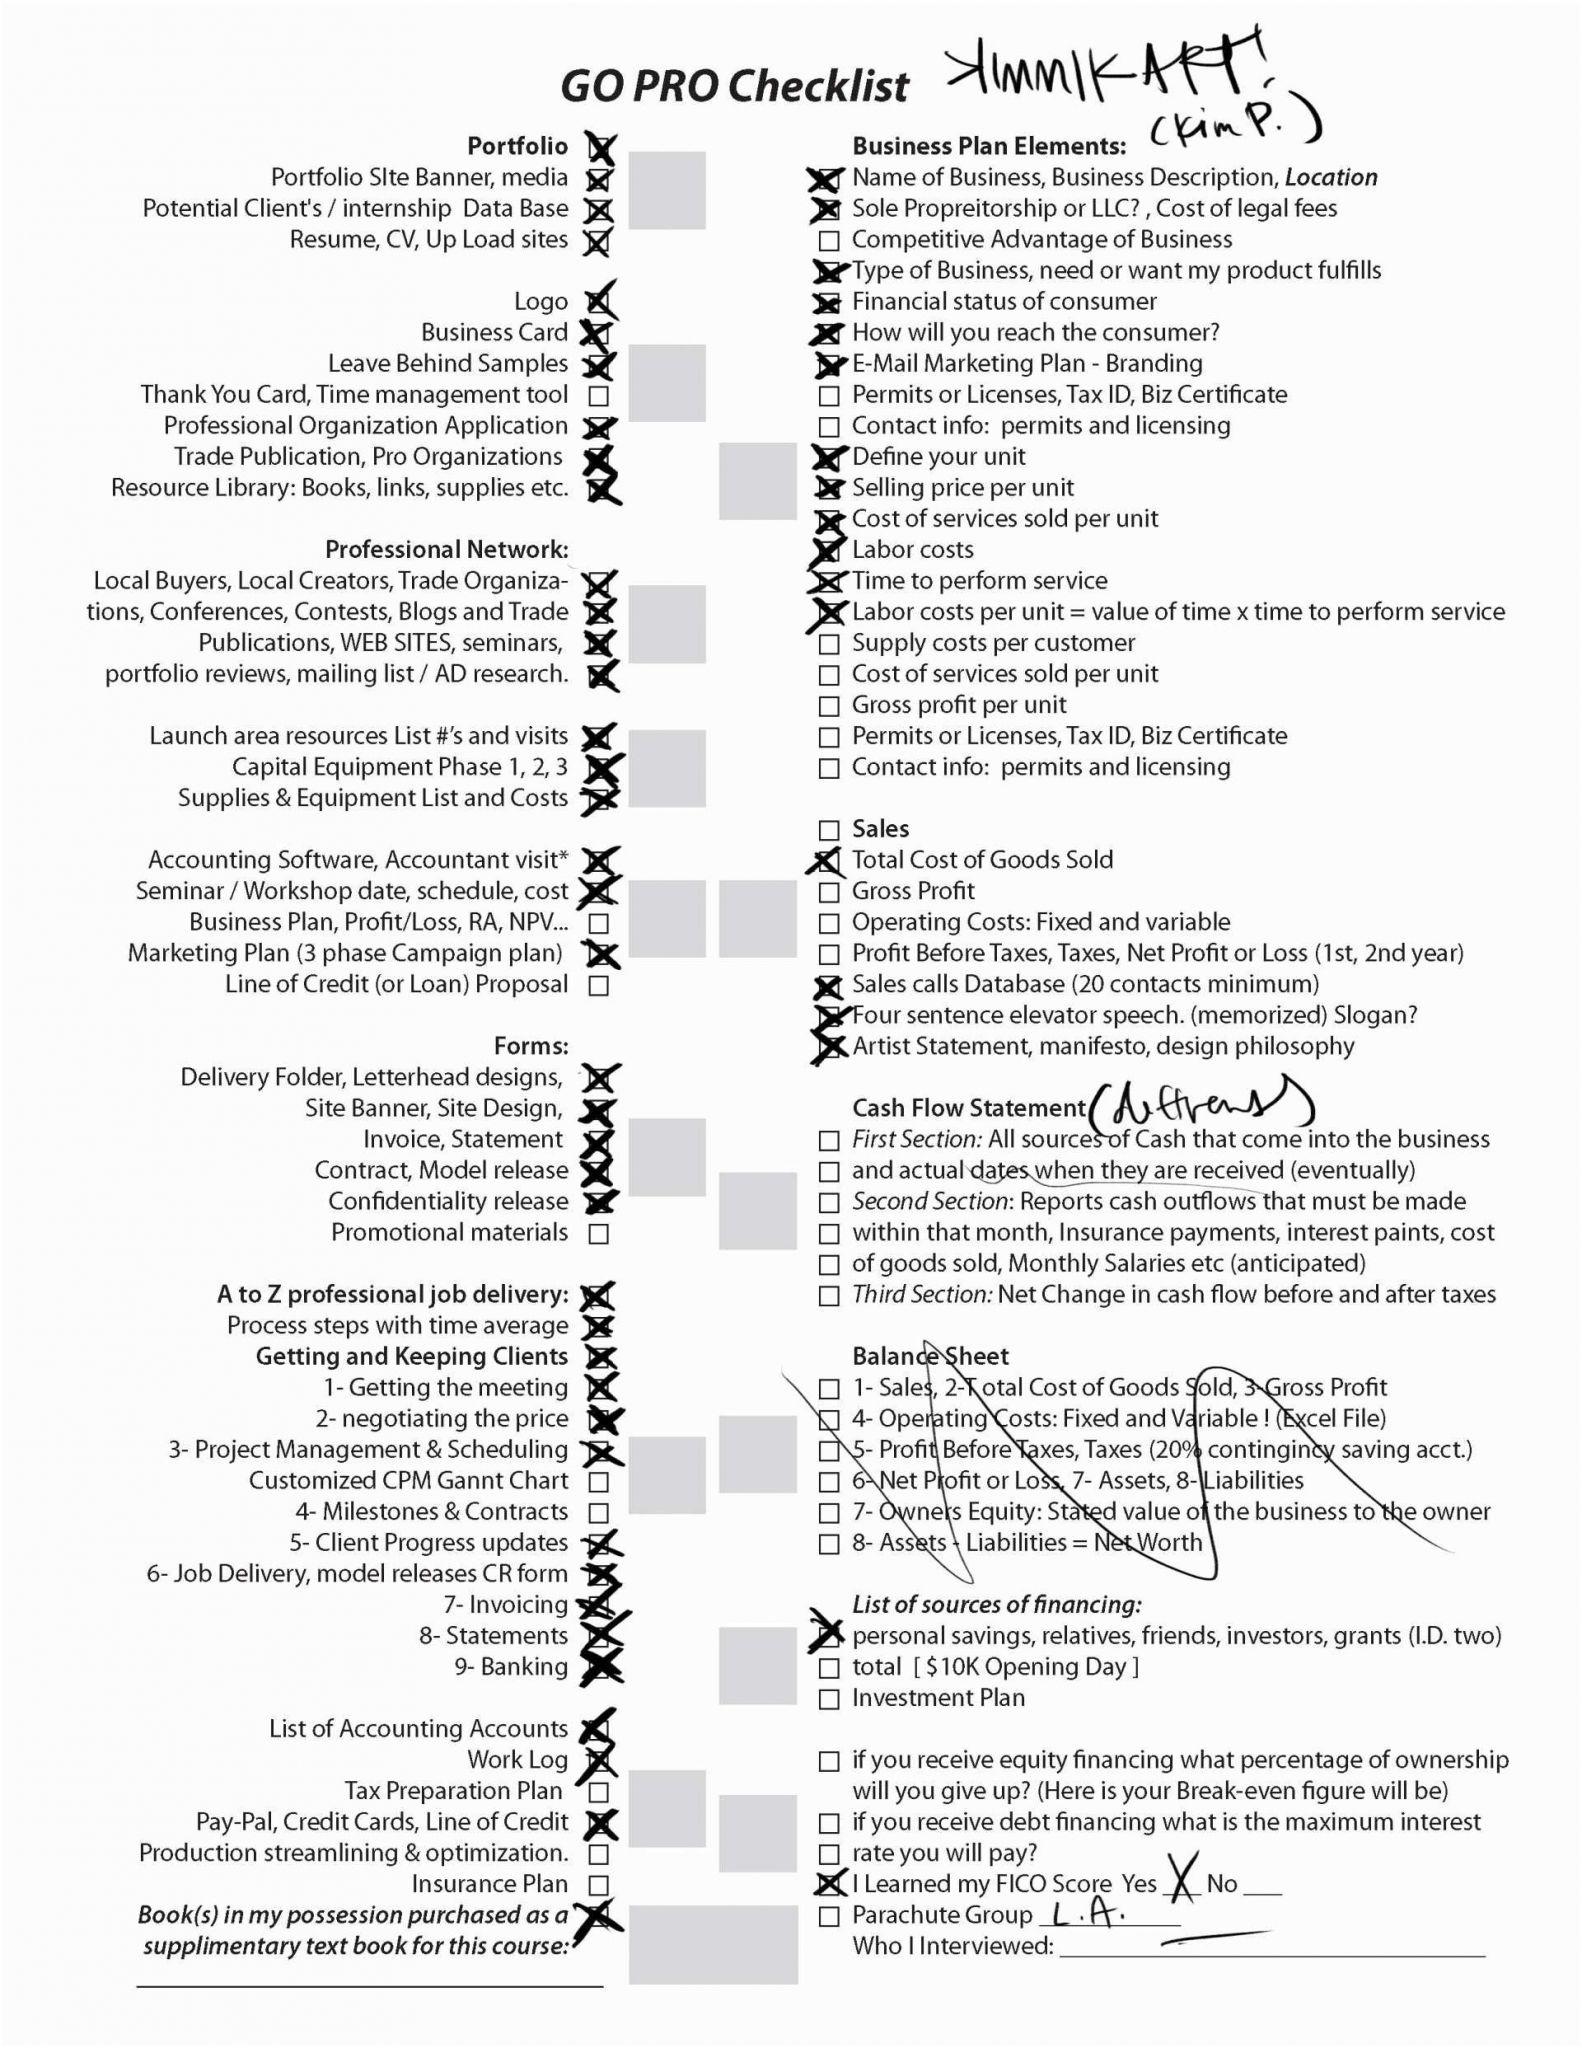 5Th Grade Spelling Words Worksheets | Briefencounters - Free Printable Spelling Worksheets For 5Th Grade